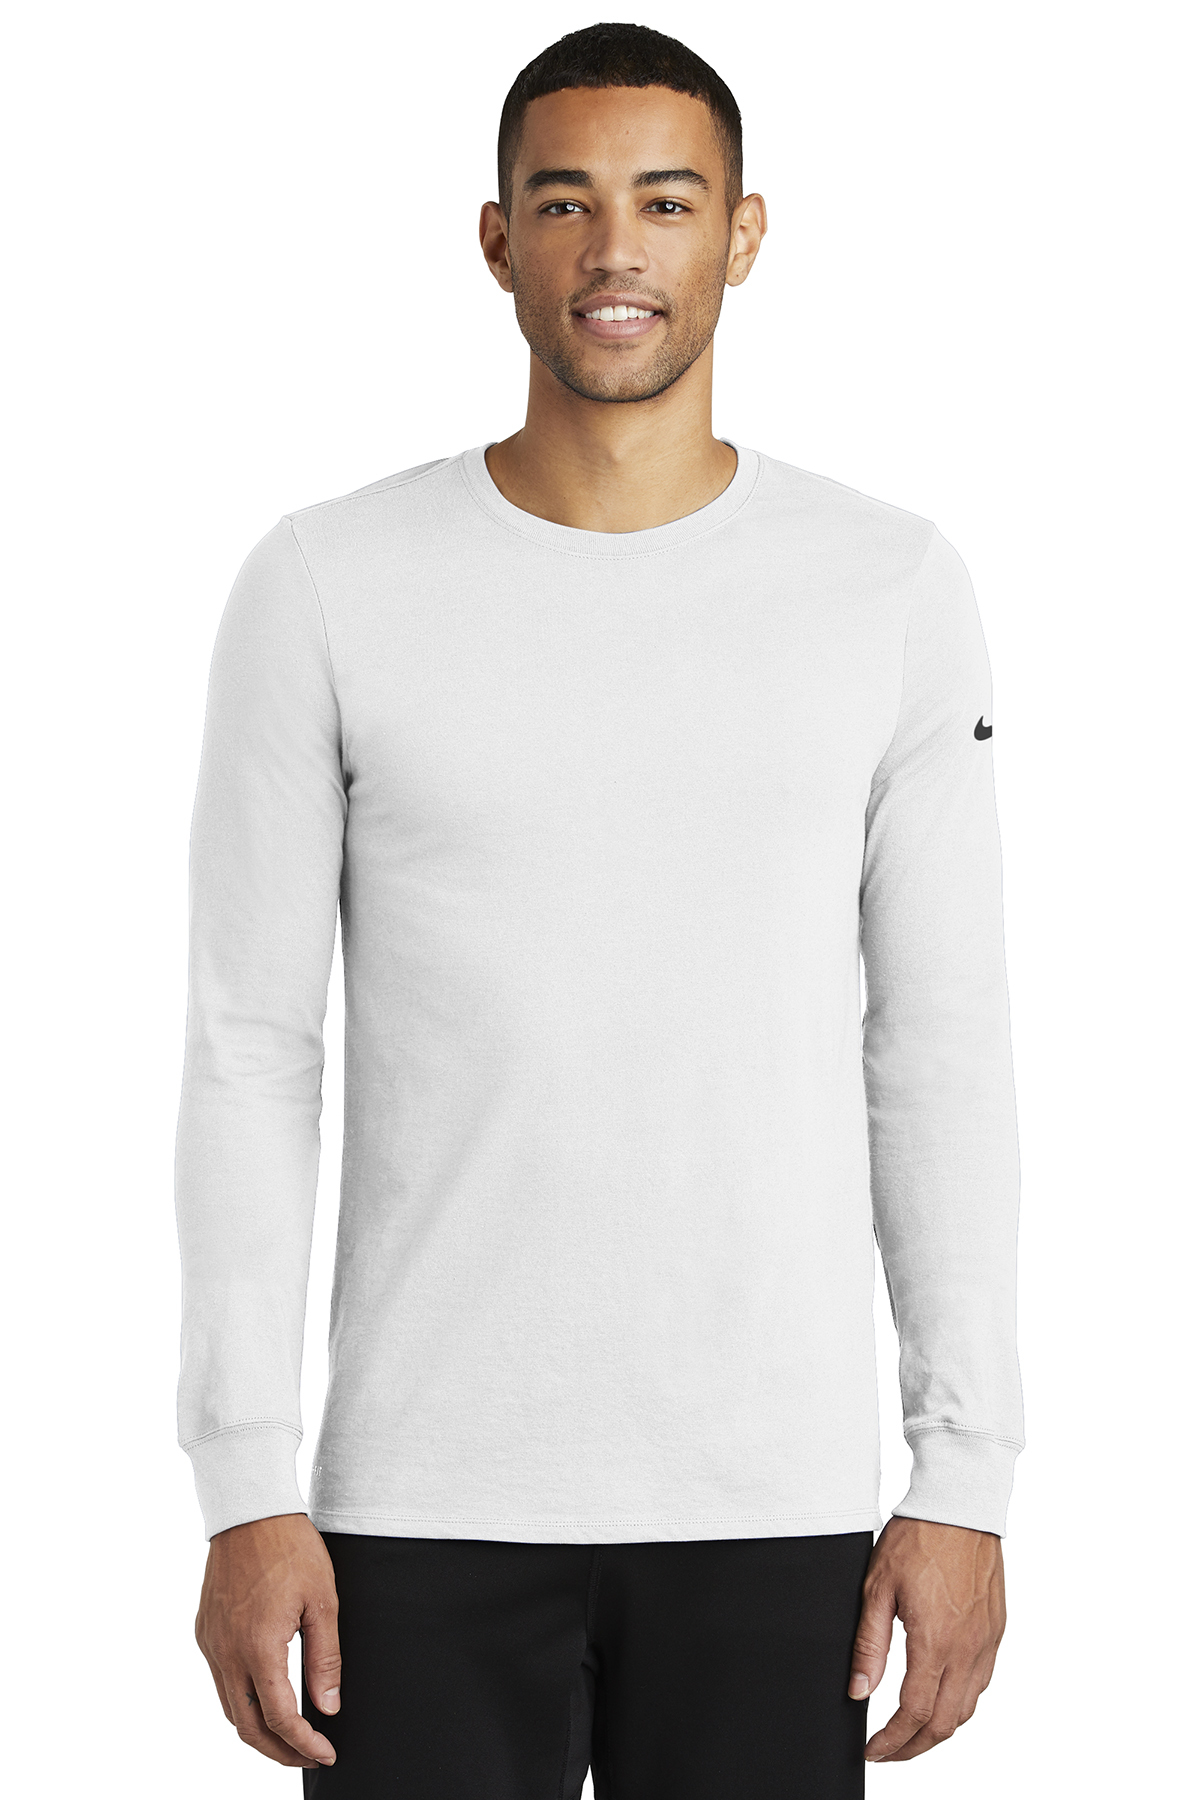 Nike Dri-FIT Cotton/Poly Long Sleeve